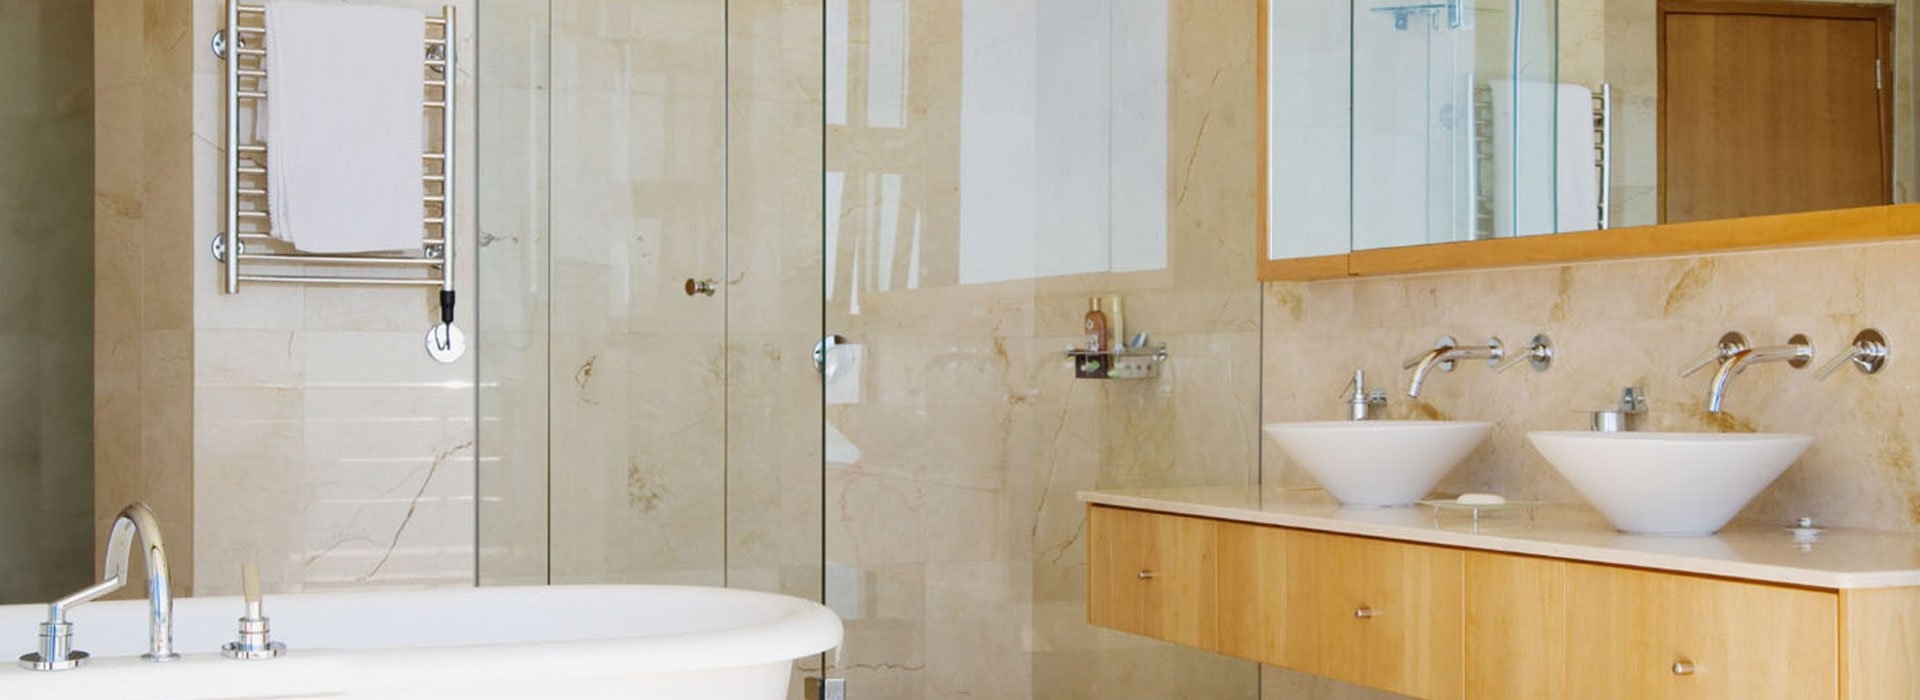 dual white sink